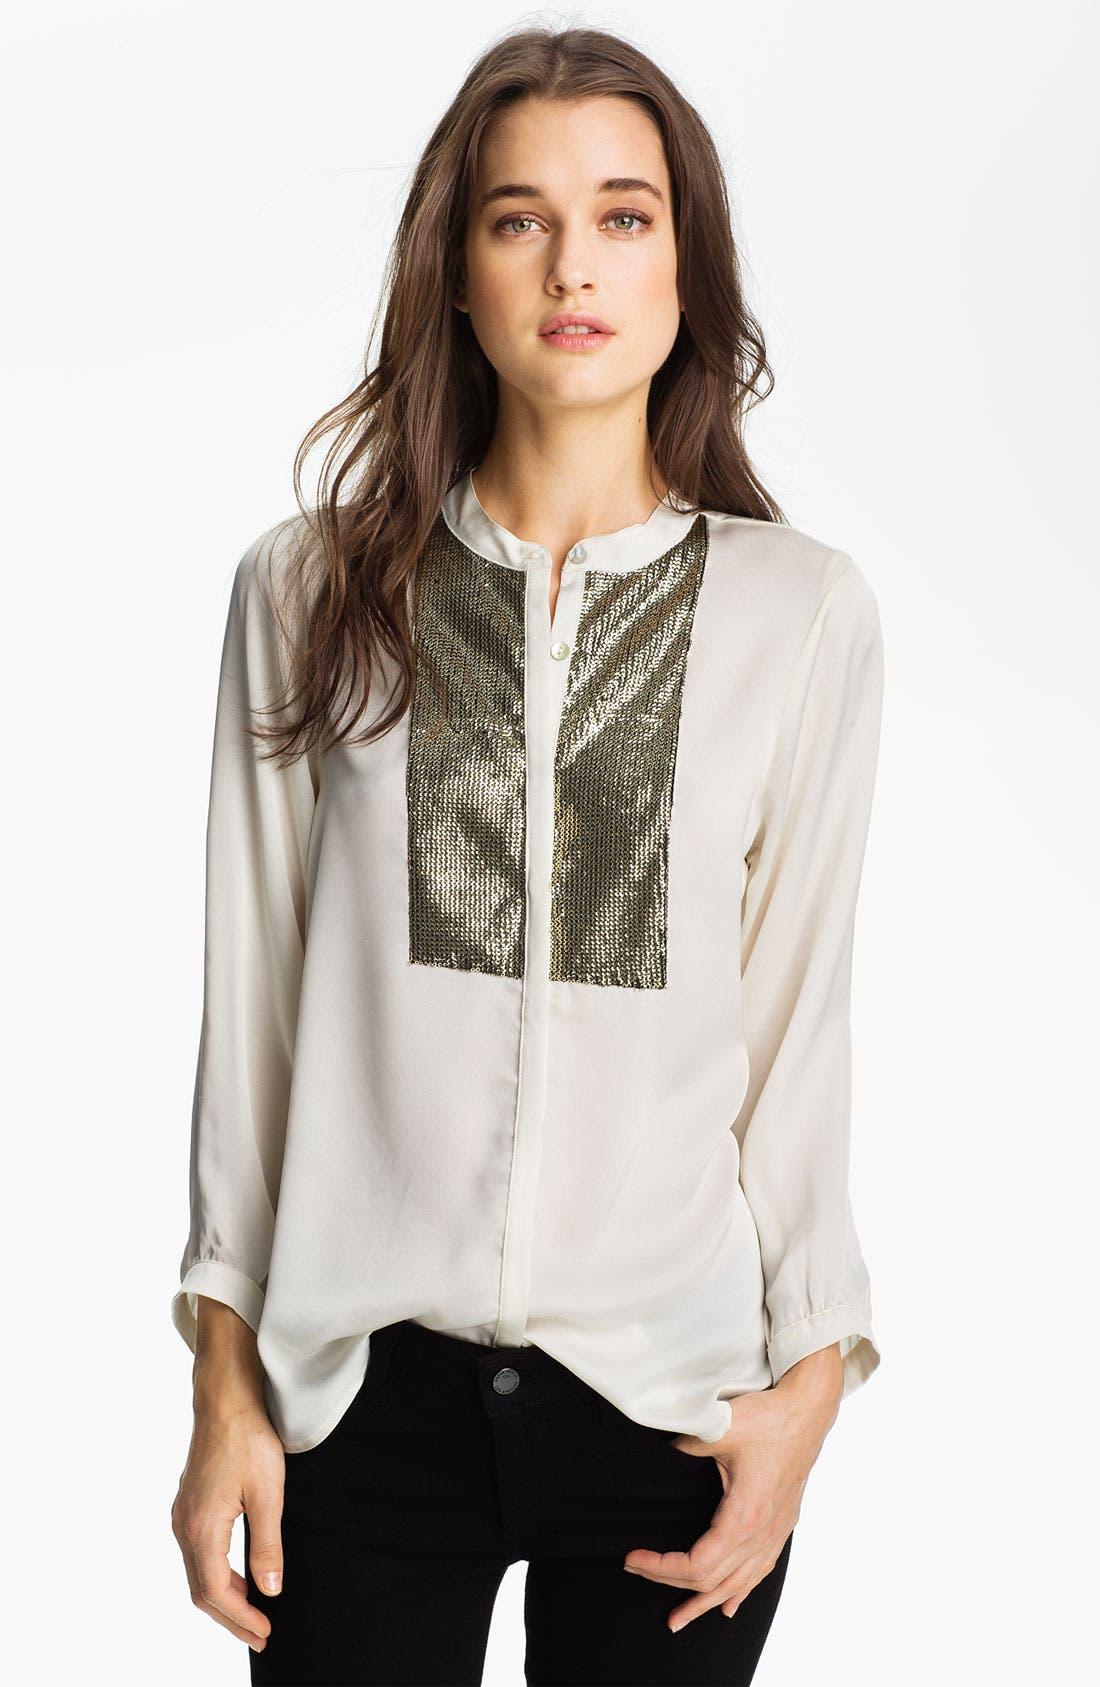 Alternate Image 1 Selected - Patterson J. Kincaid 'Mercury' Embellished Tux Shirt